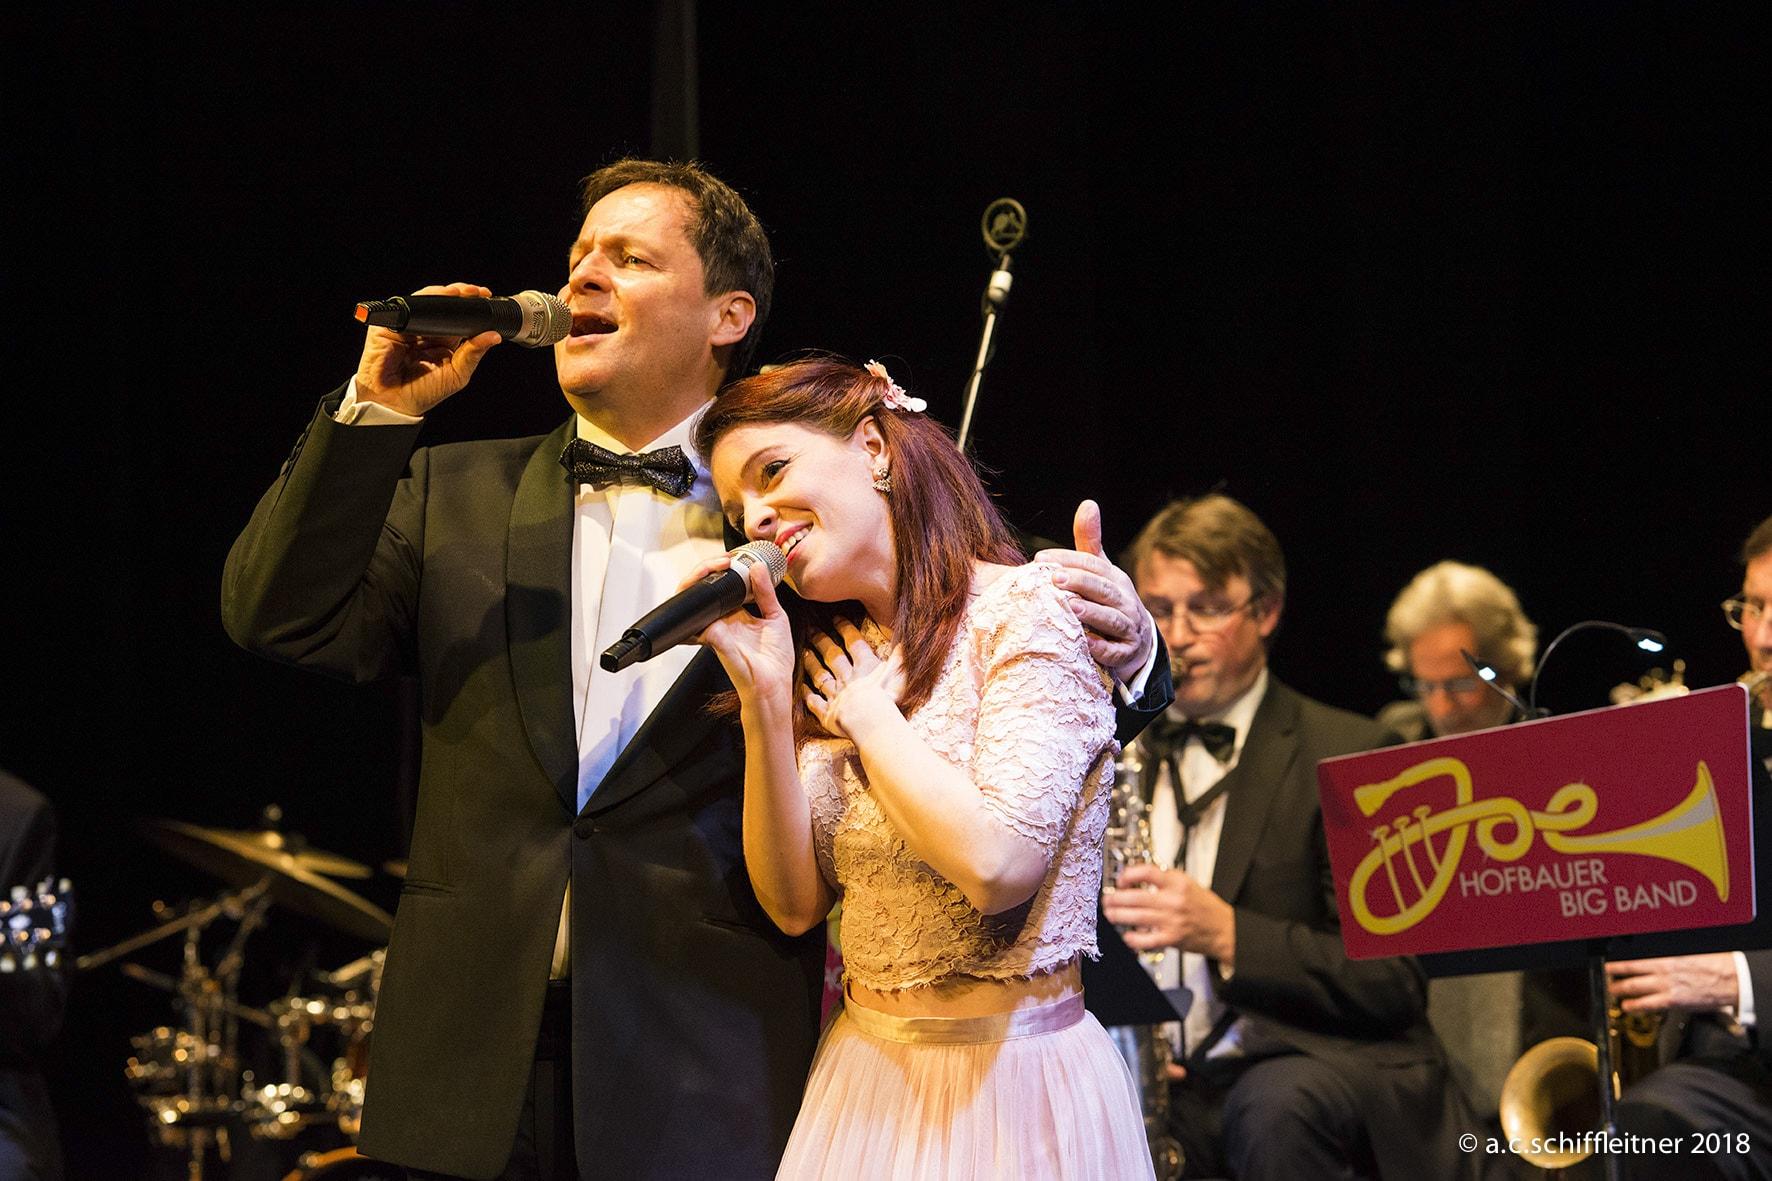 Joe Hofbauer und Nina Zissler | Foto: A.C. Schiffleitner